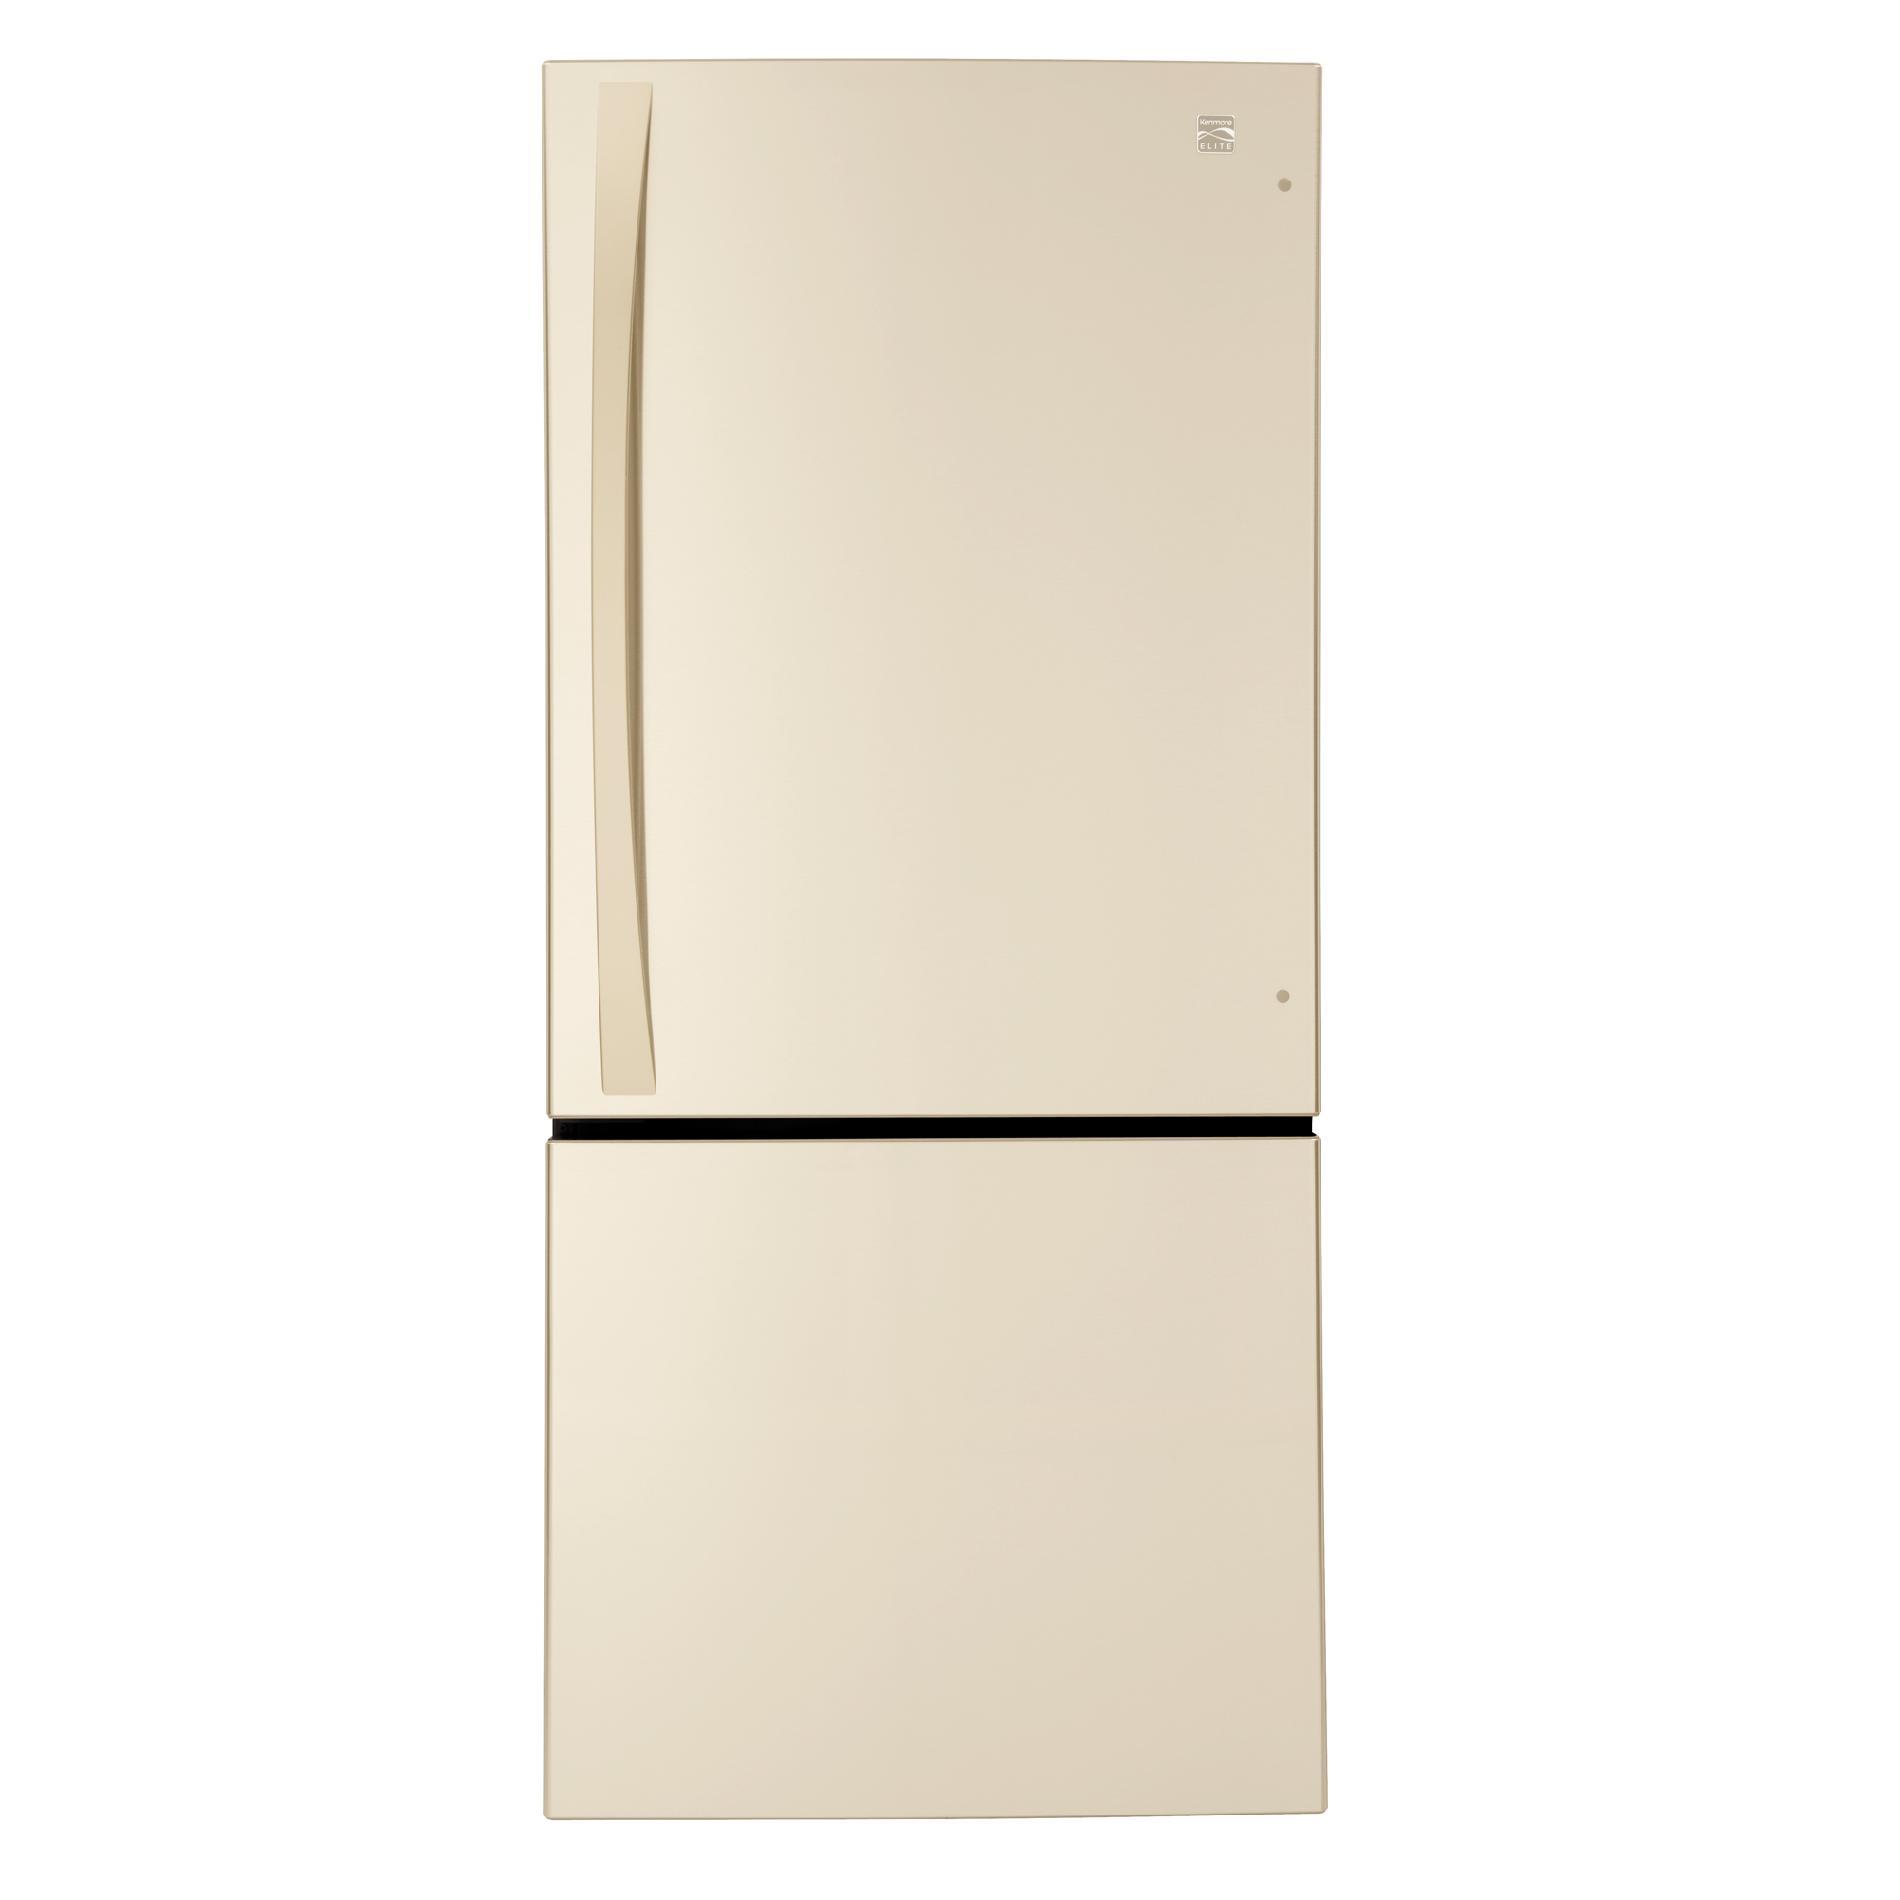 Kenmore Elite 22 cu. ft. Bottom-Freezer Refrigerator - Bisque